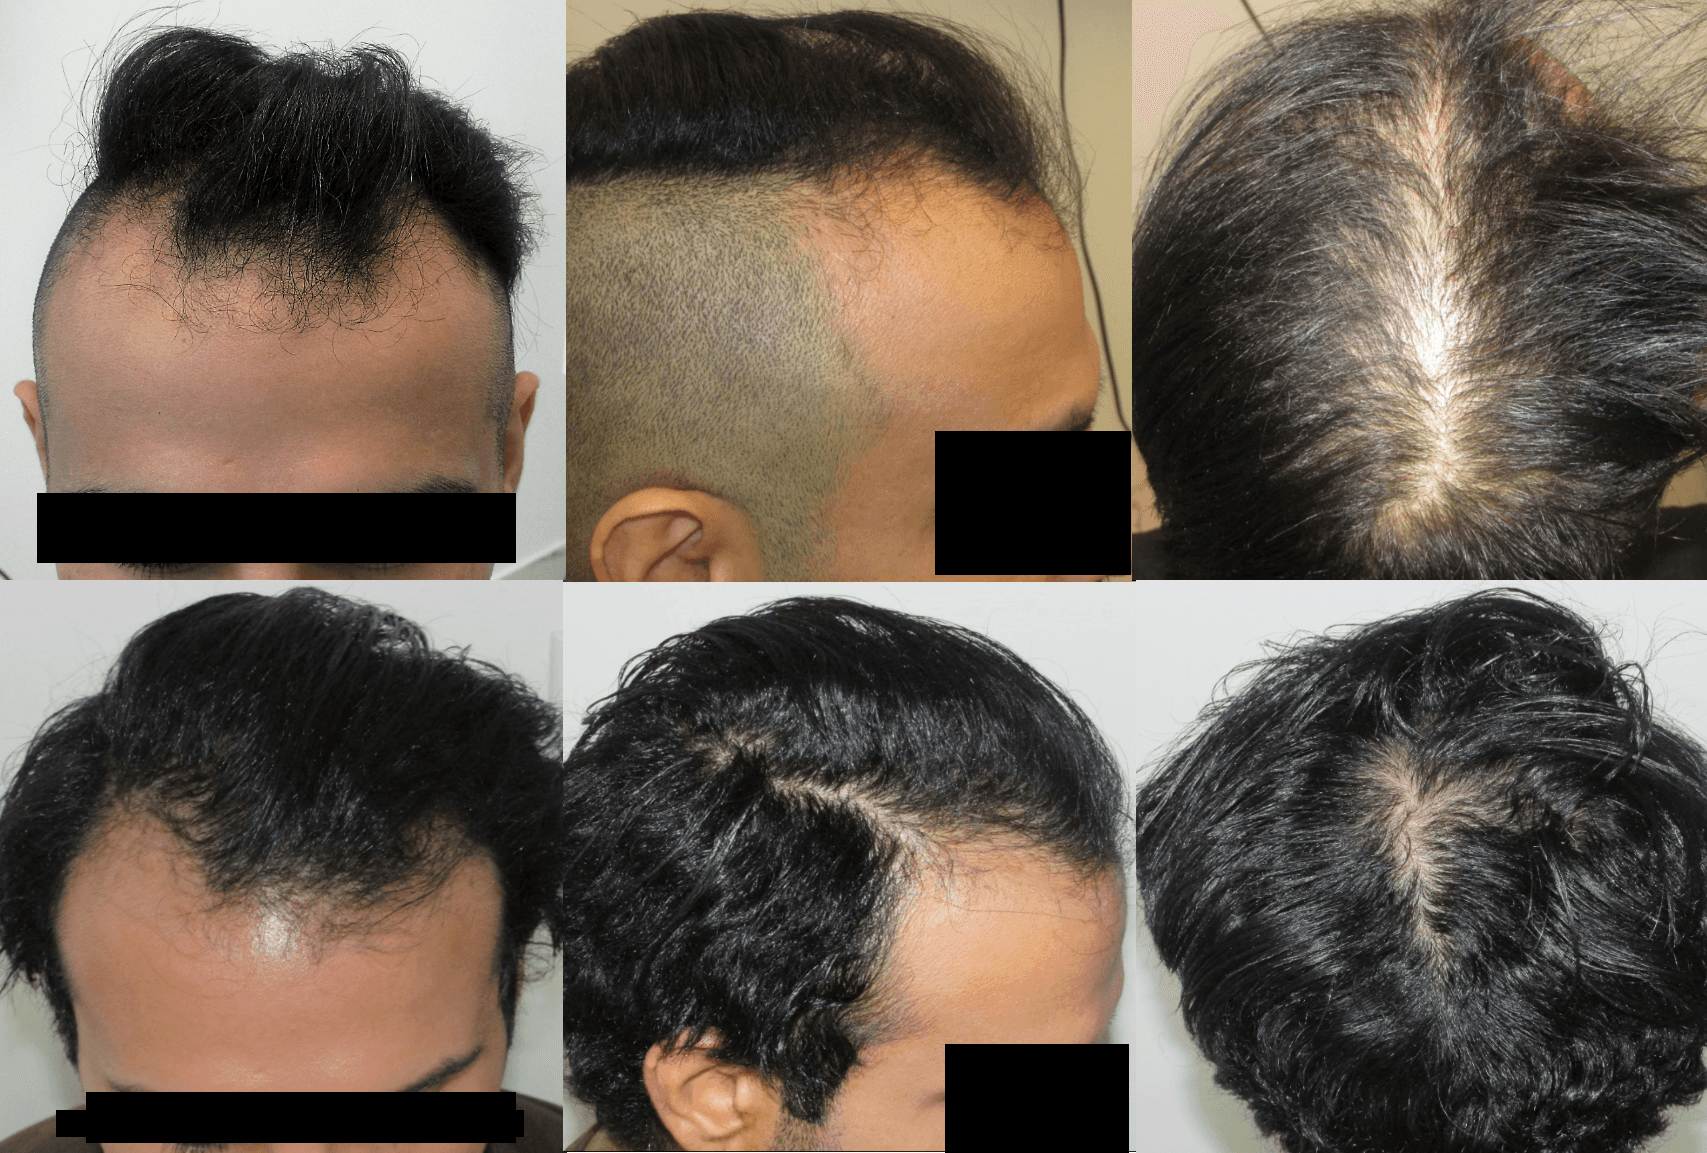 Best receding hair loss treatment for male pattern baldness